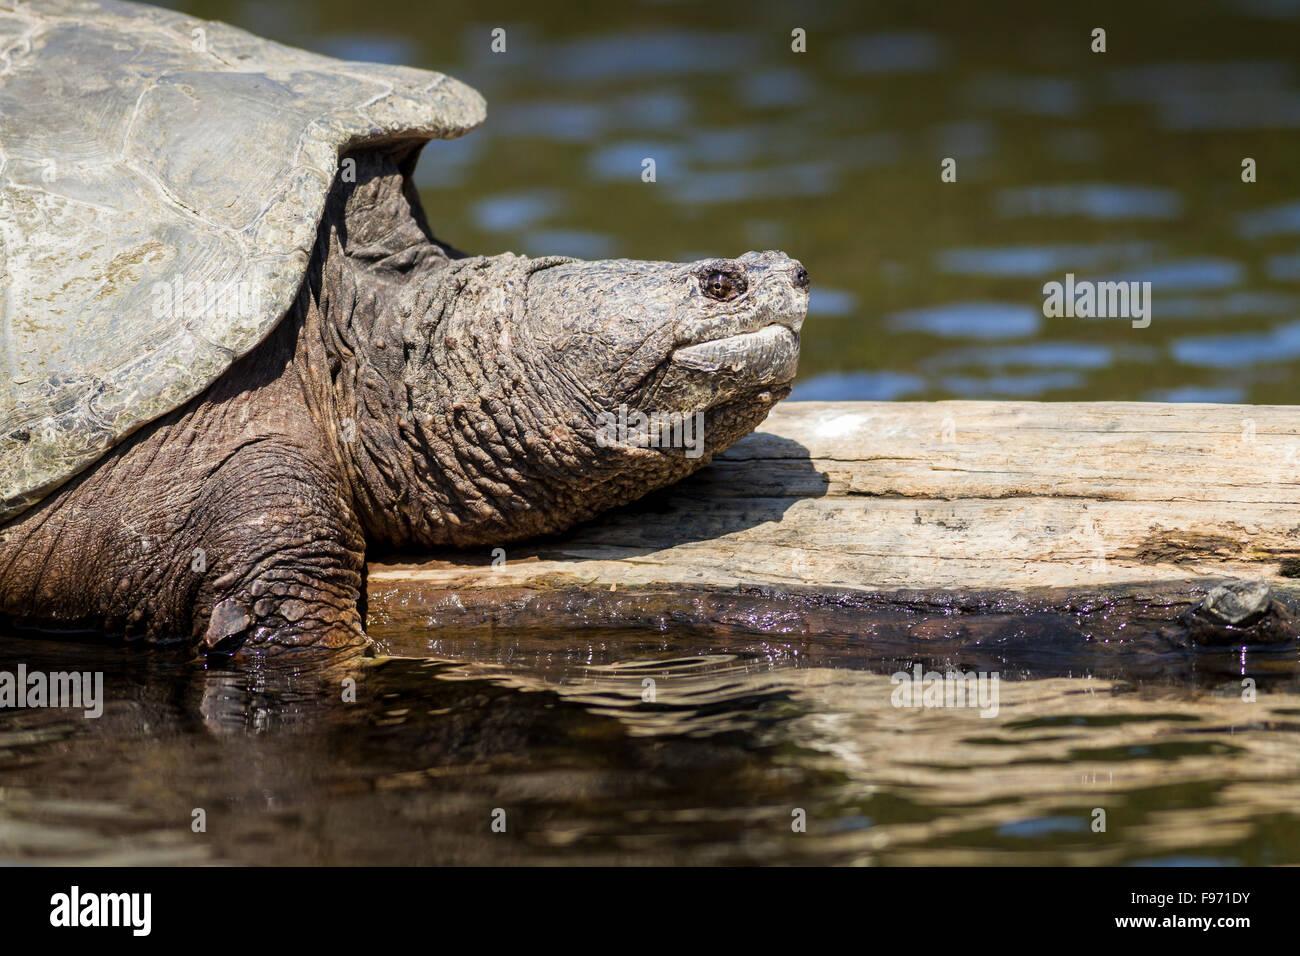 Snapping Turtle (Chelydra serpentina) sunning on a log, Killarney Provincial Park, Ontario - Stock Image